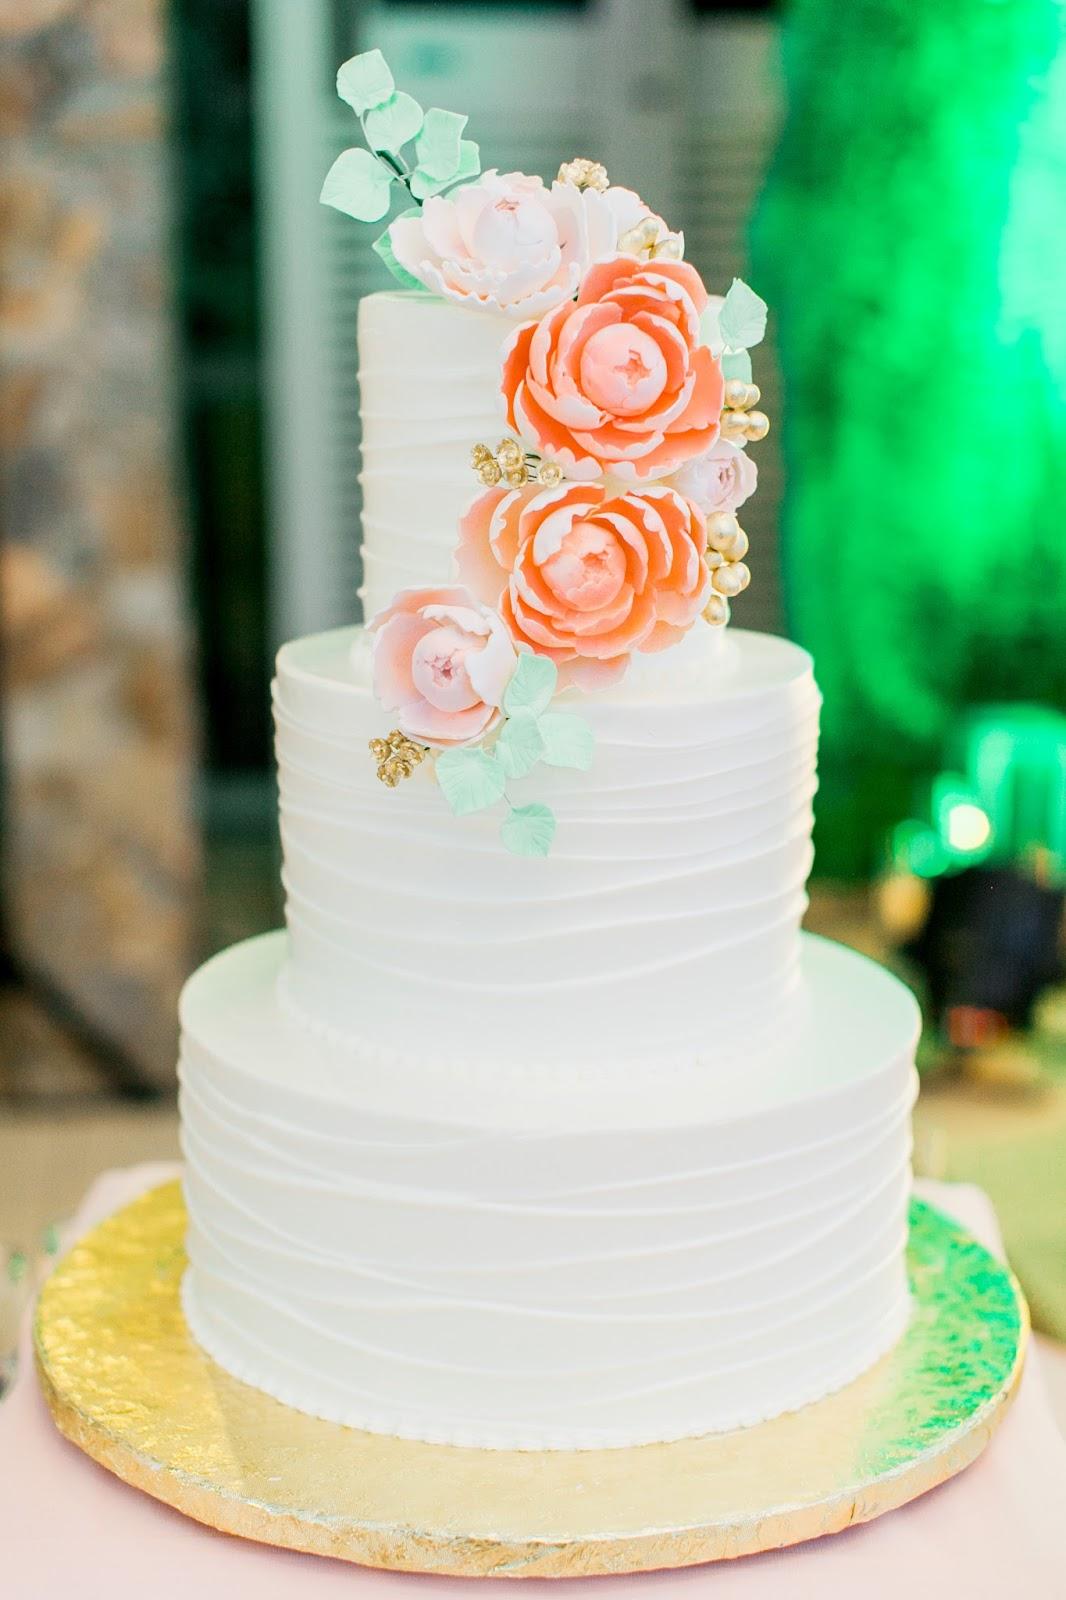 romyisagirl: Wedding Supplier Review: Our Cake by Joy San Gabriel